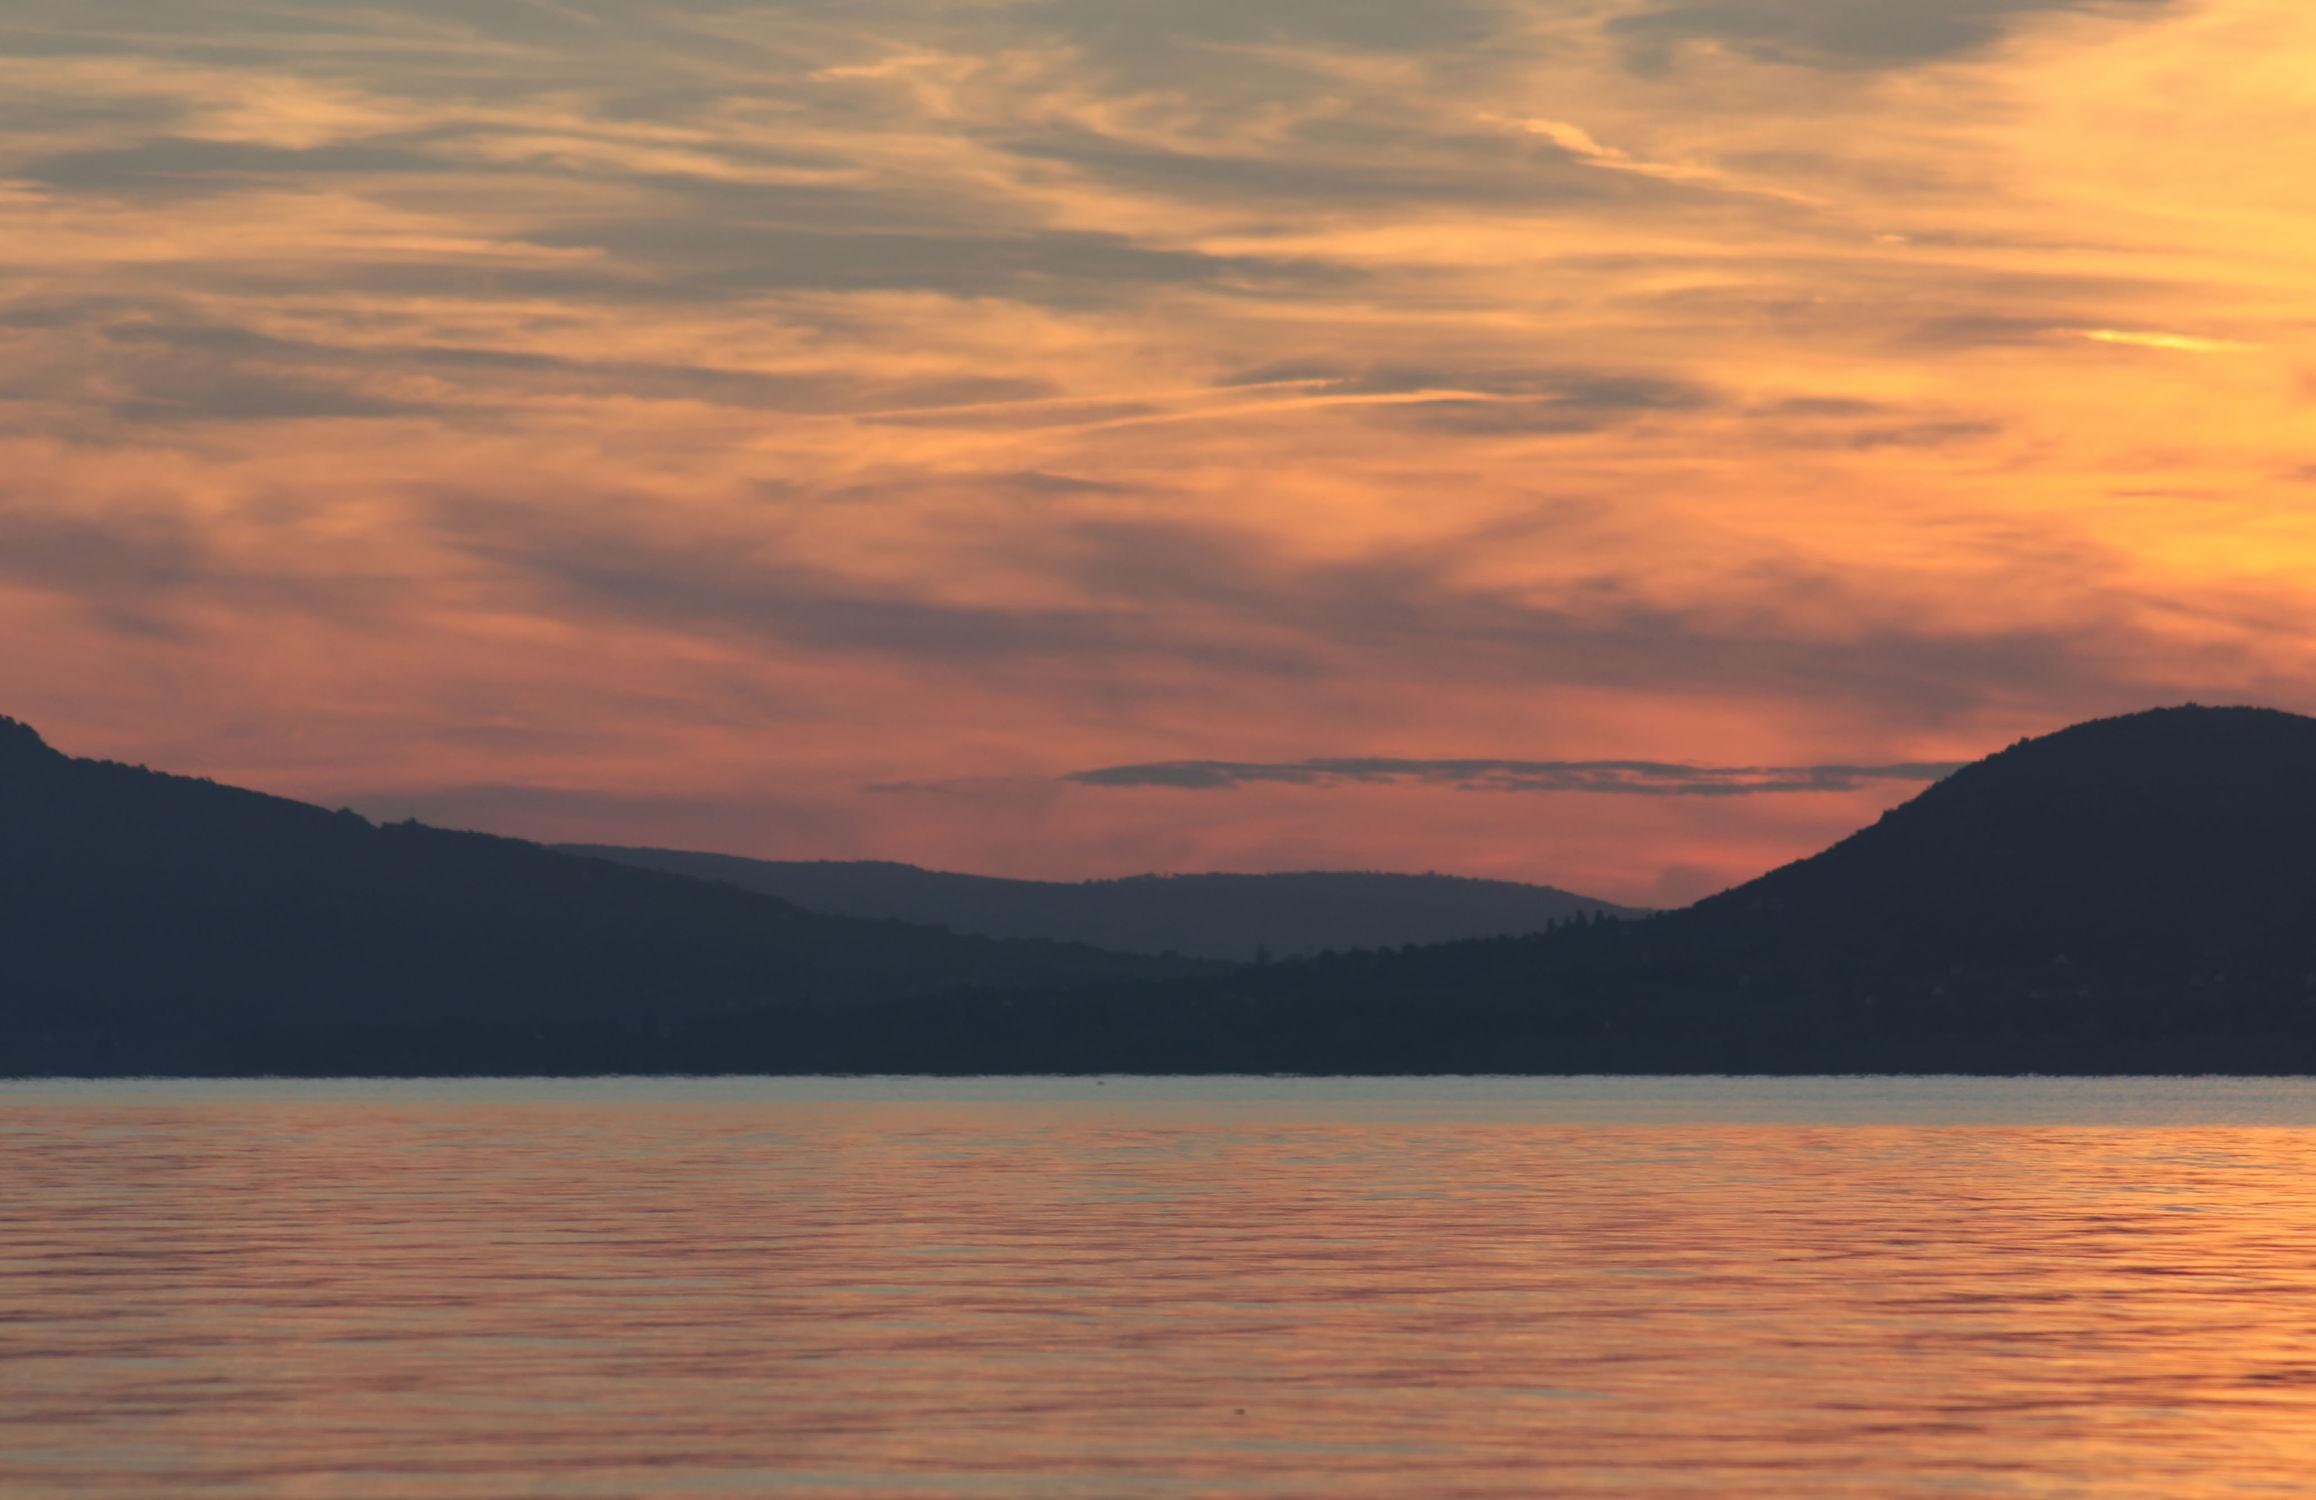 Bild mit Berge und Hügel, Berge, Gewässer, Seen, Sonnenuntergang, Sonnenaufgang, Sonne, Bergsee, See, berg